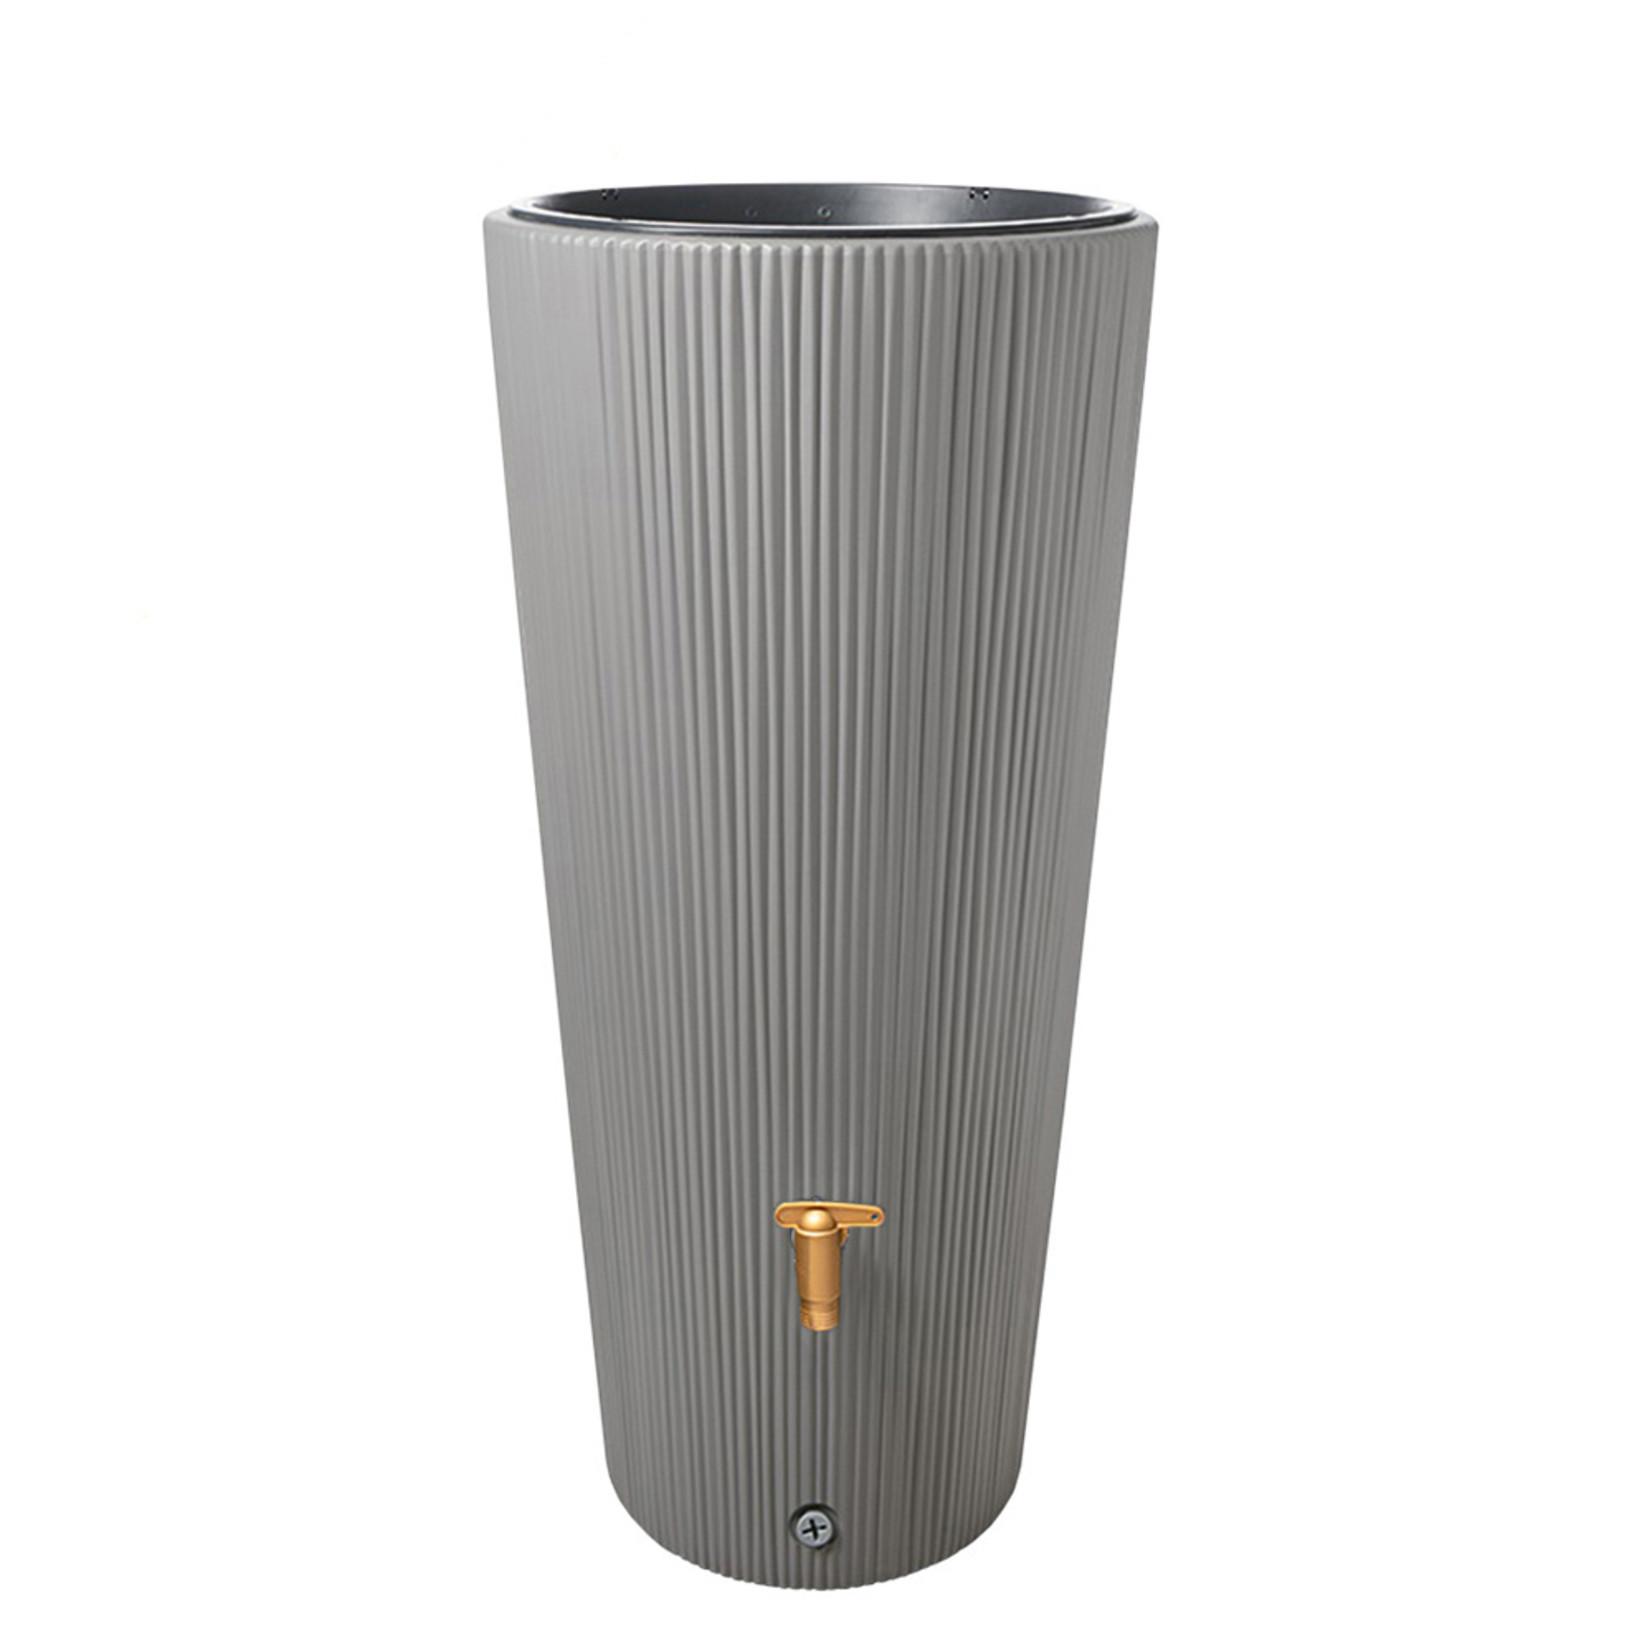 Garantia 2in1 ton VASO DECOR 220 liter grijs ø 58(max) x h.120 cm